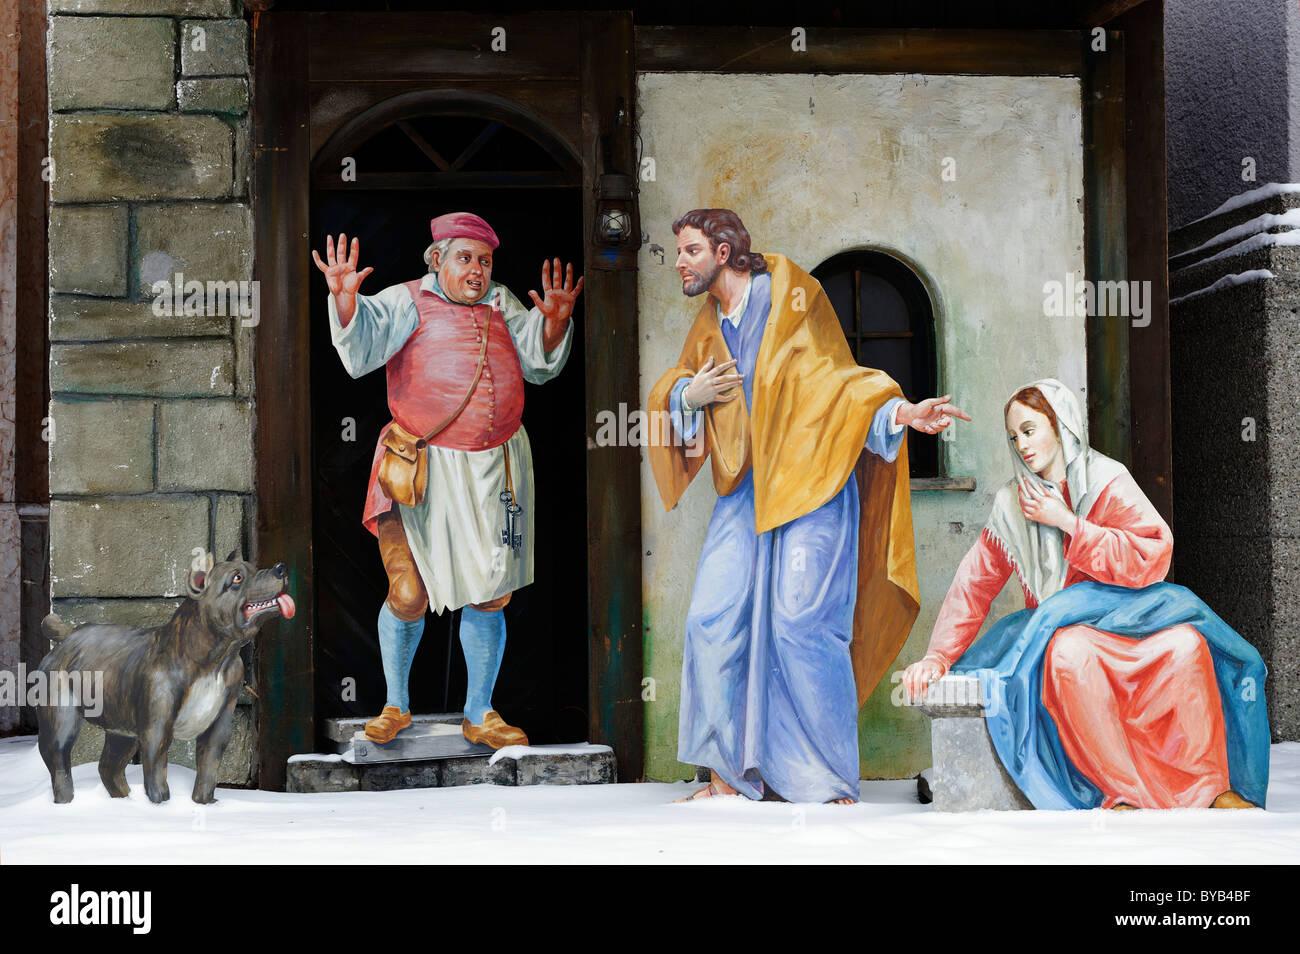 Looking for a hostel, nativity scene, Bruder-Konrad-Platz square, Altoetting, Upper Bavaria, Germany, Europe - Stock Image